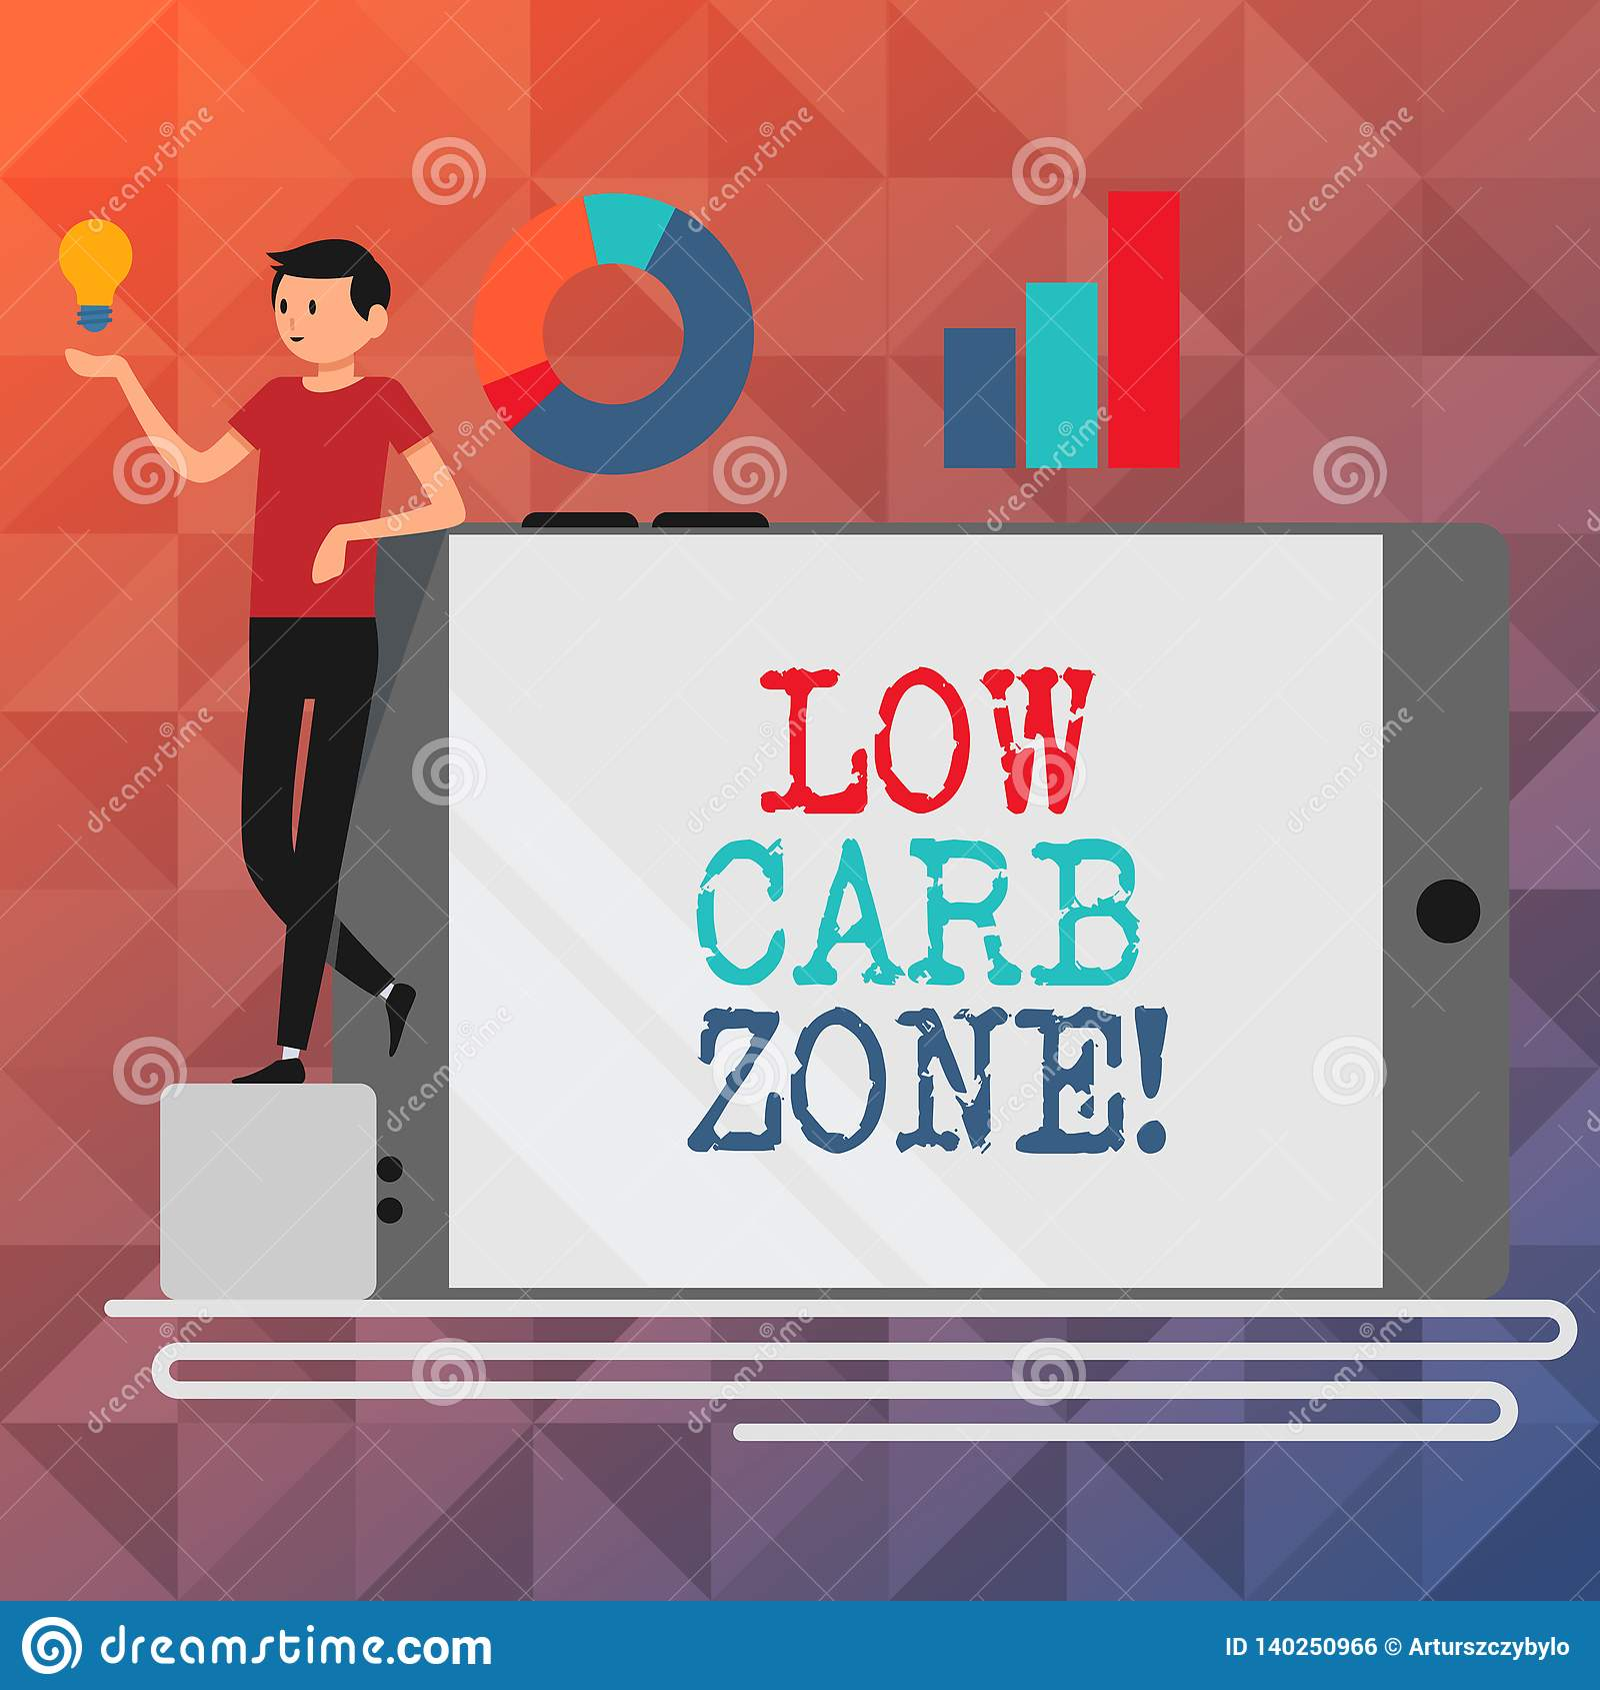 Free zone diet menu plan